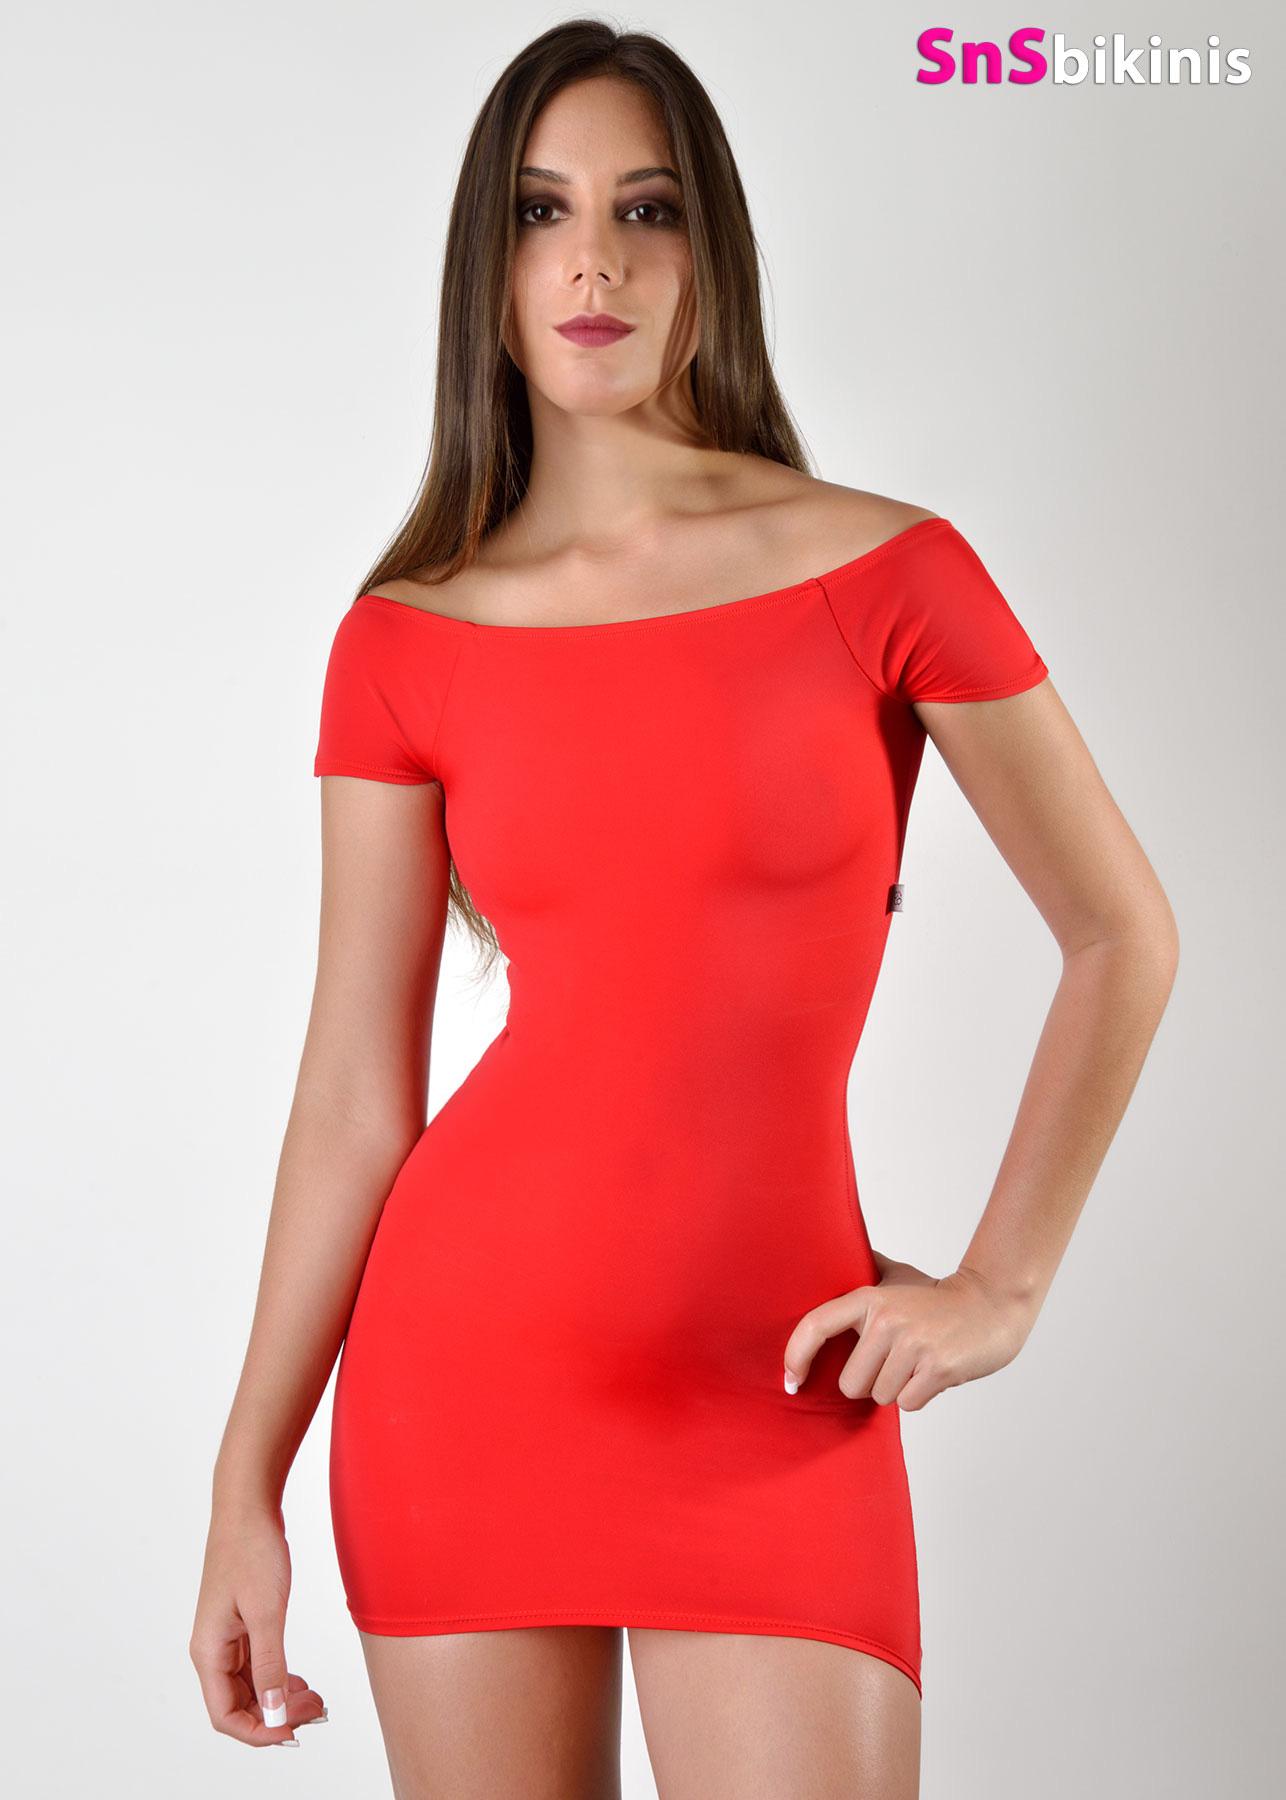 SABRINA Sexy Mini Dress [SHBR002] - $81.00 : SnSbikinis ...